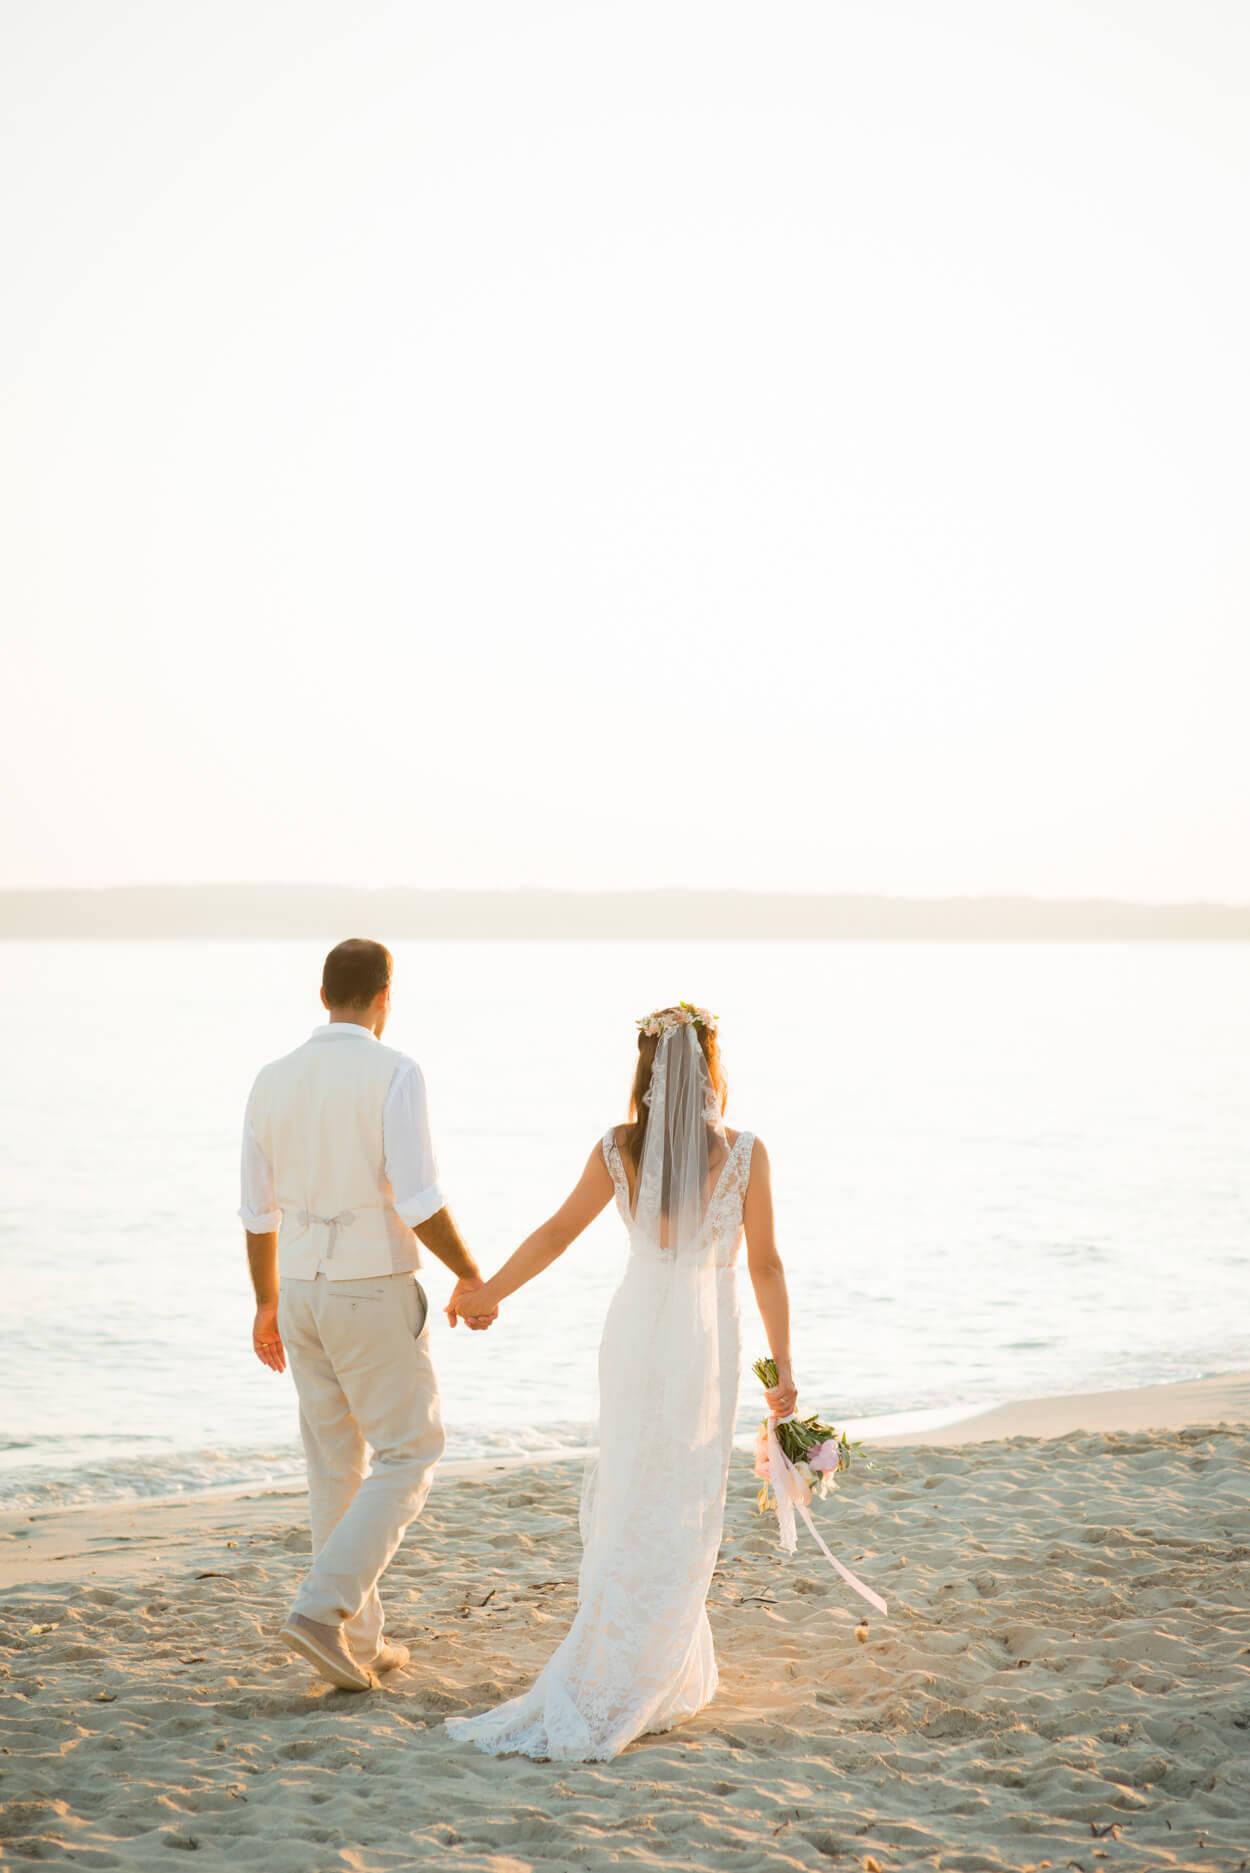 beach walk sunset bride groom lace veil